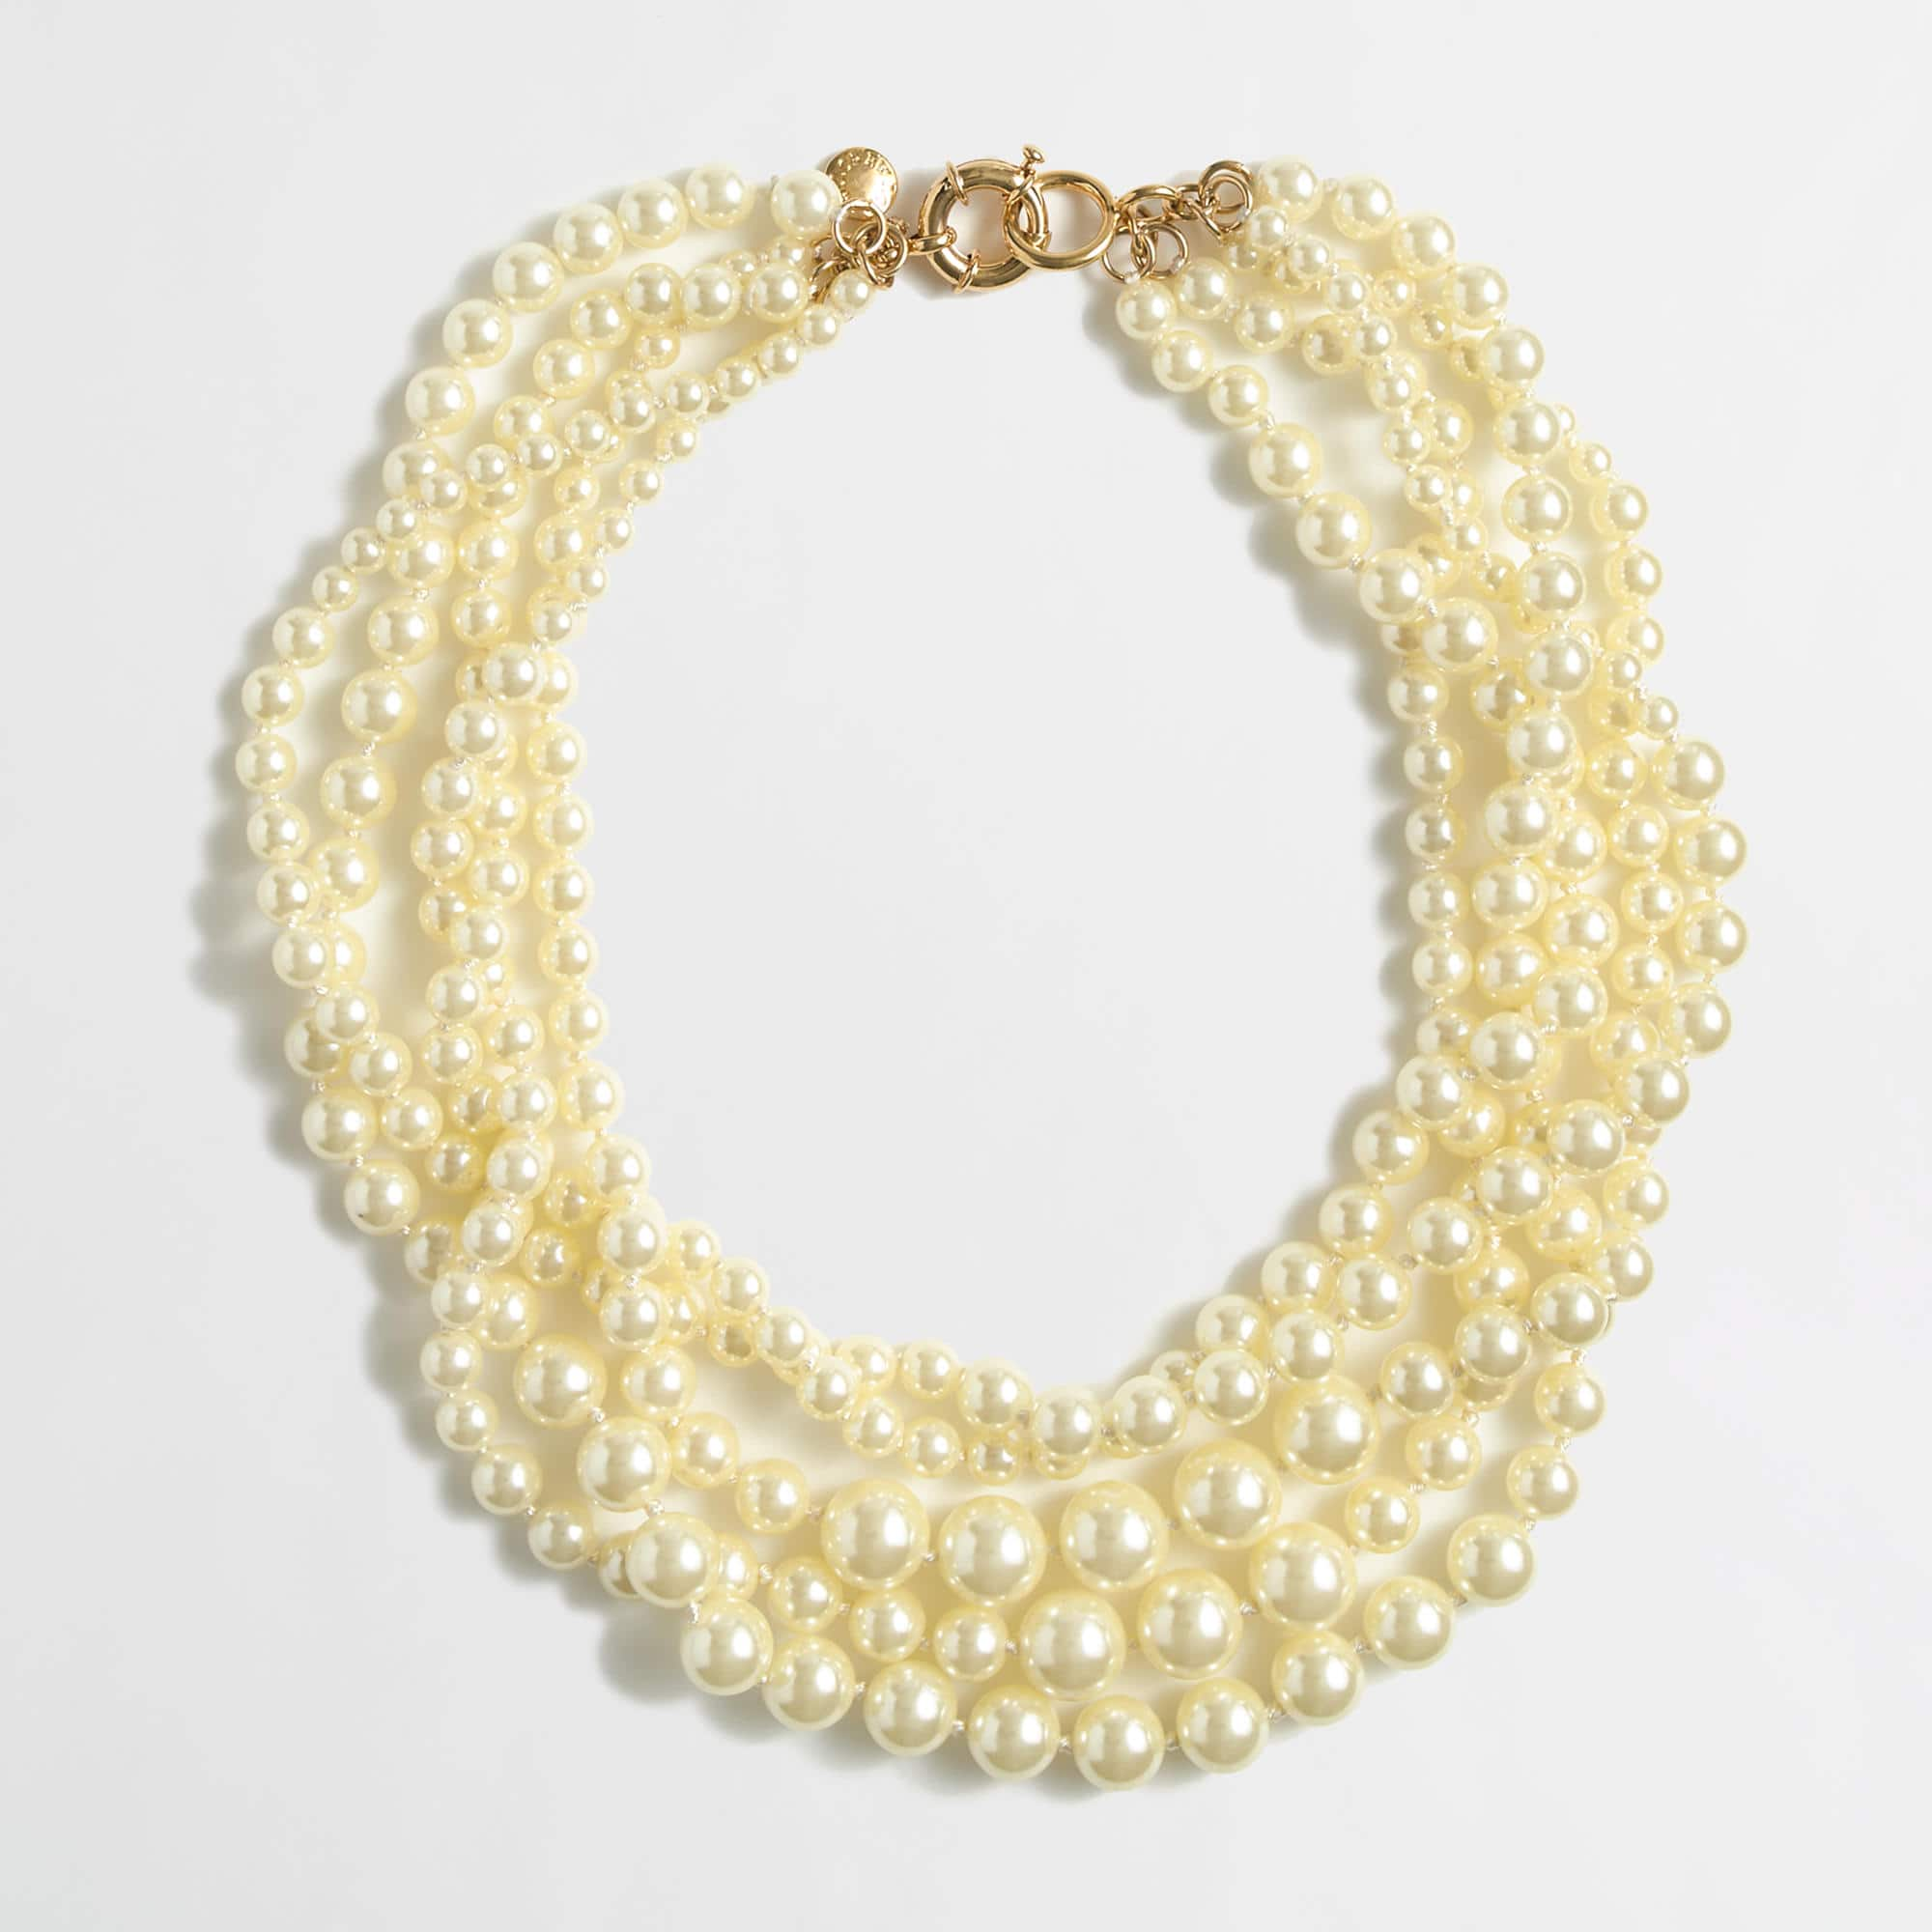 J.Crew Factory Multi-Strand Pearl Necklace